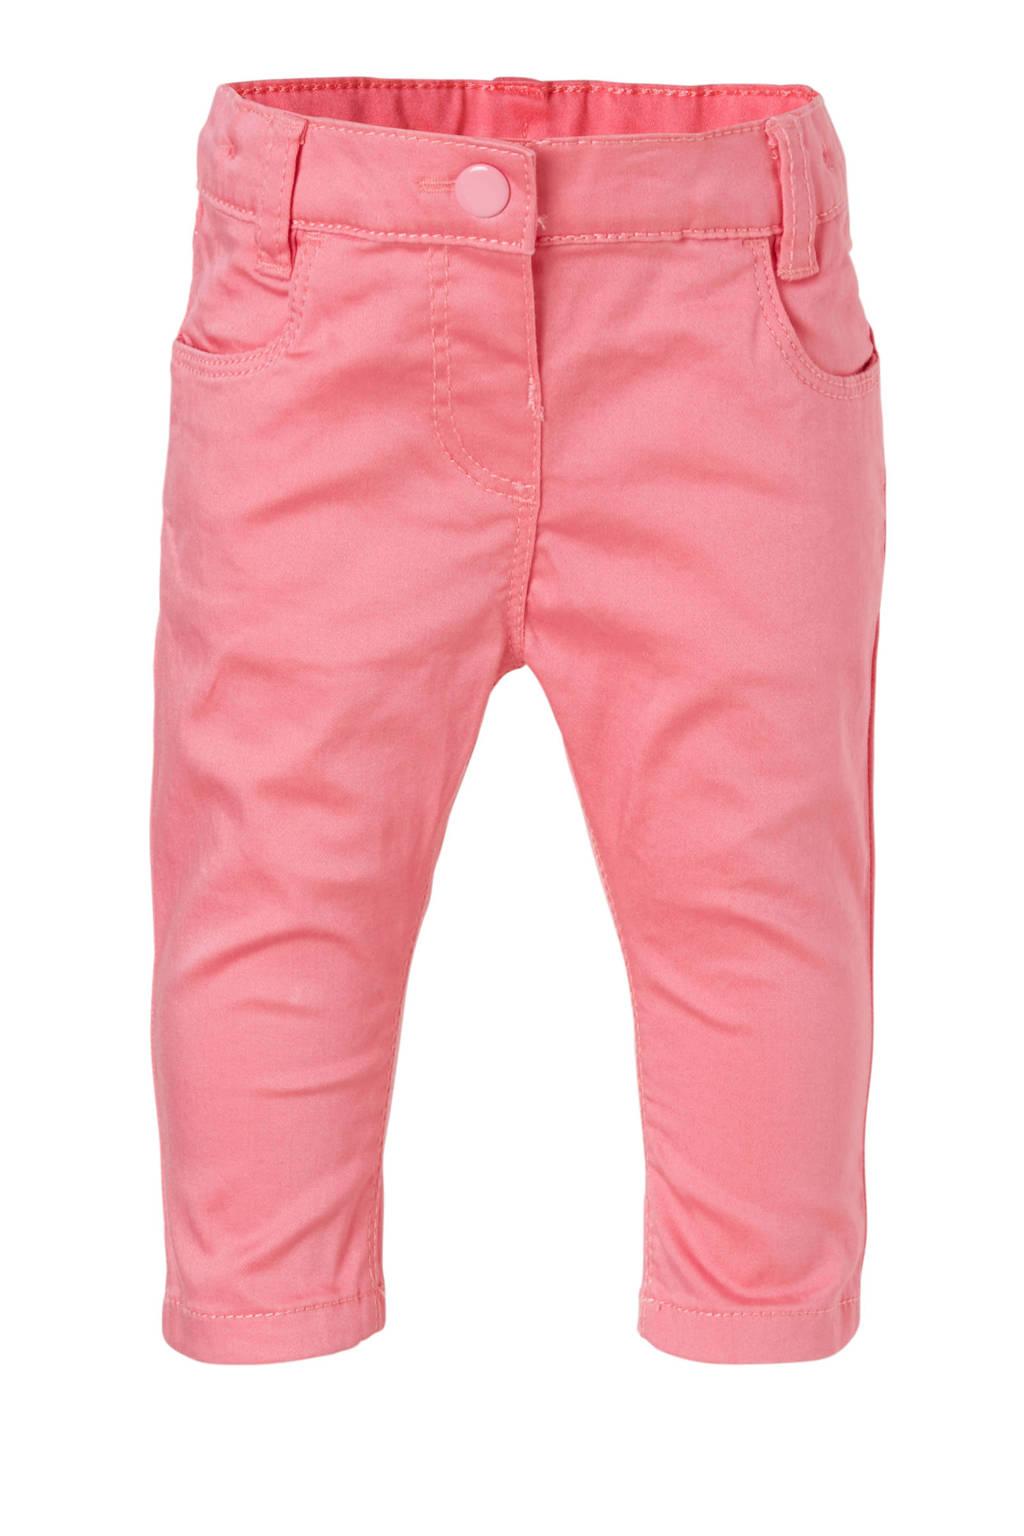 C&A Baby Club broek roze, Roze